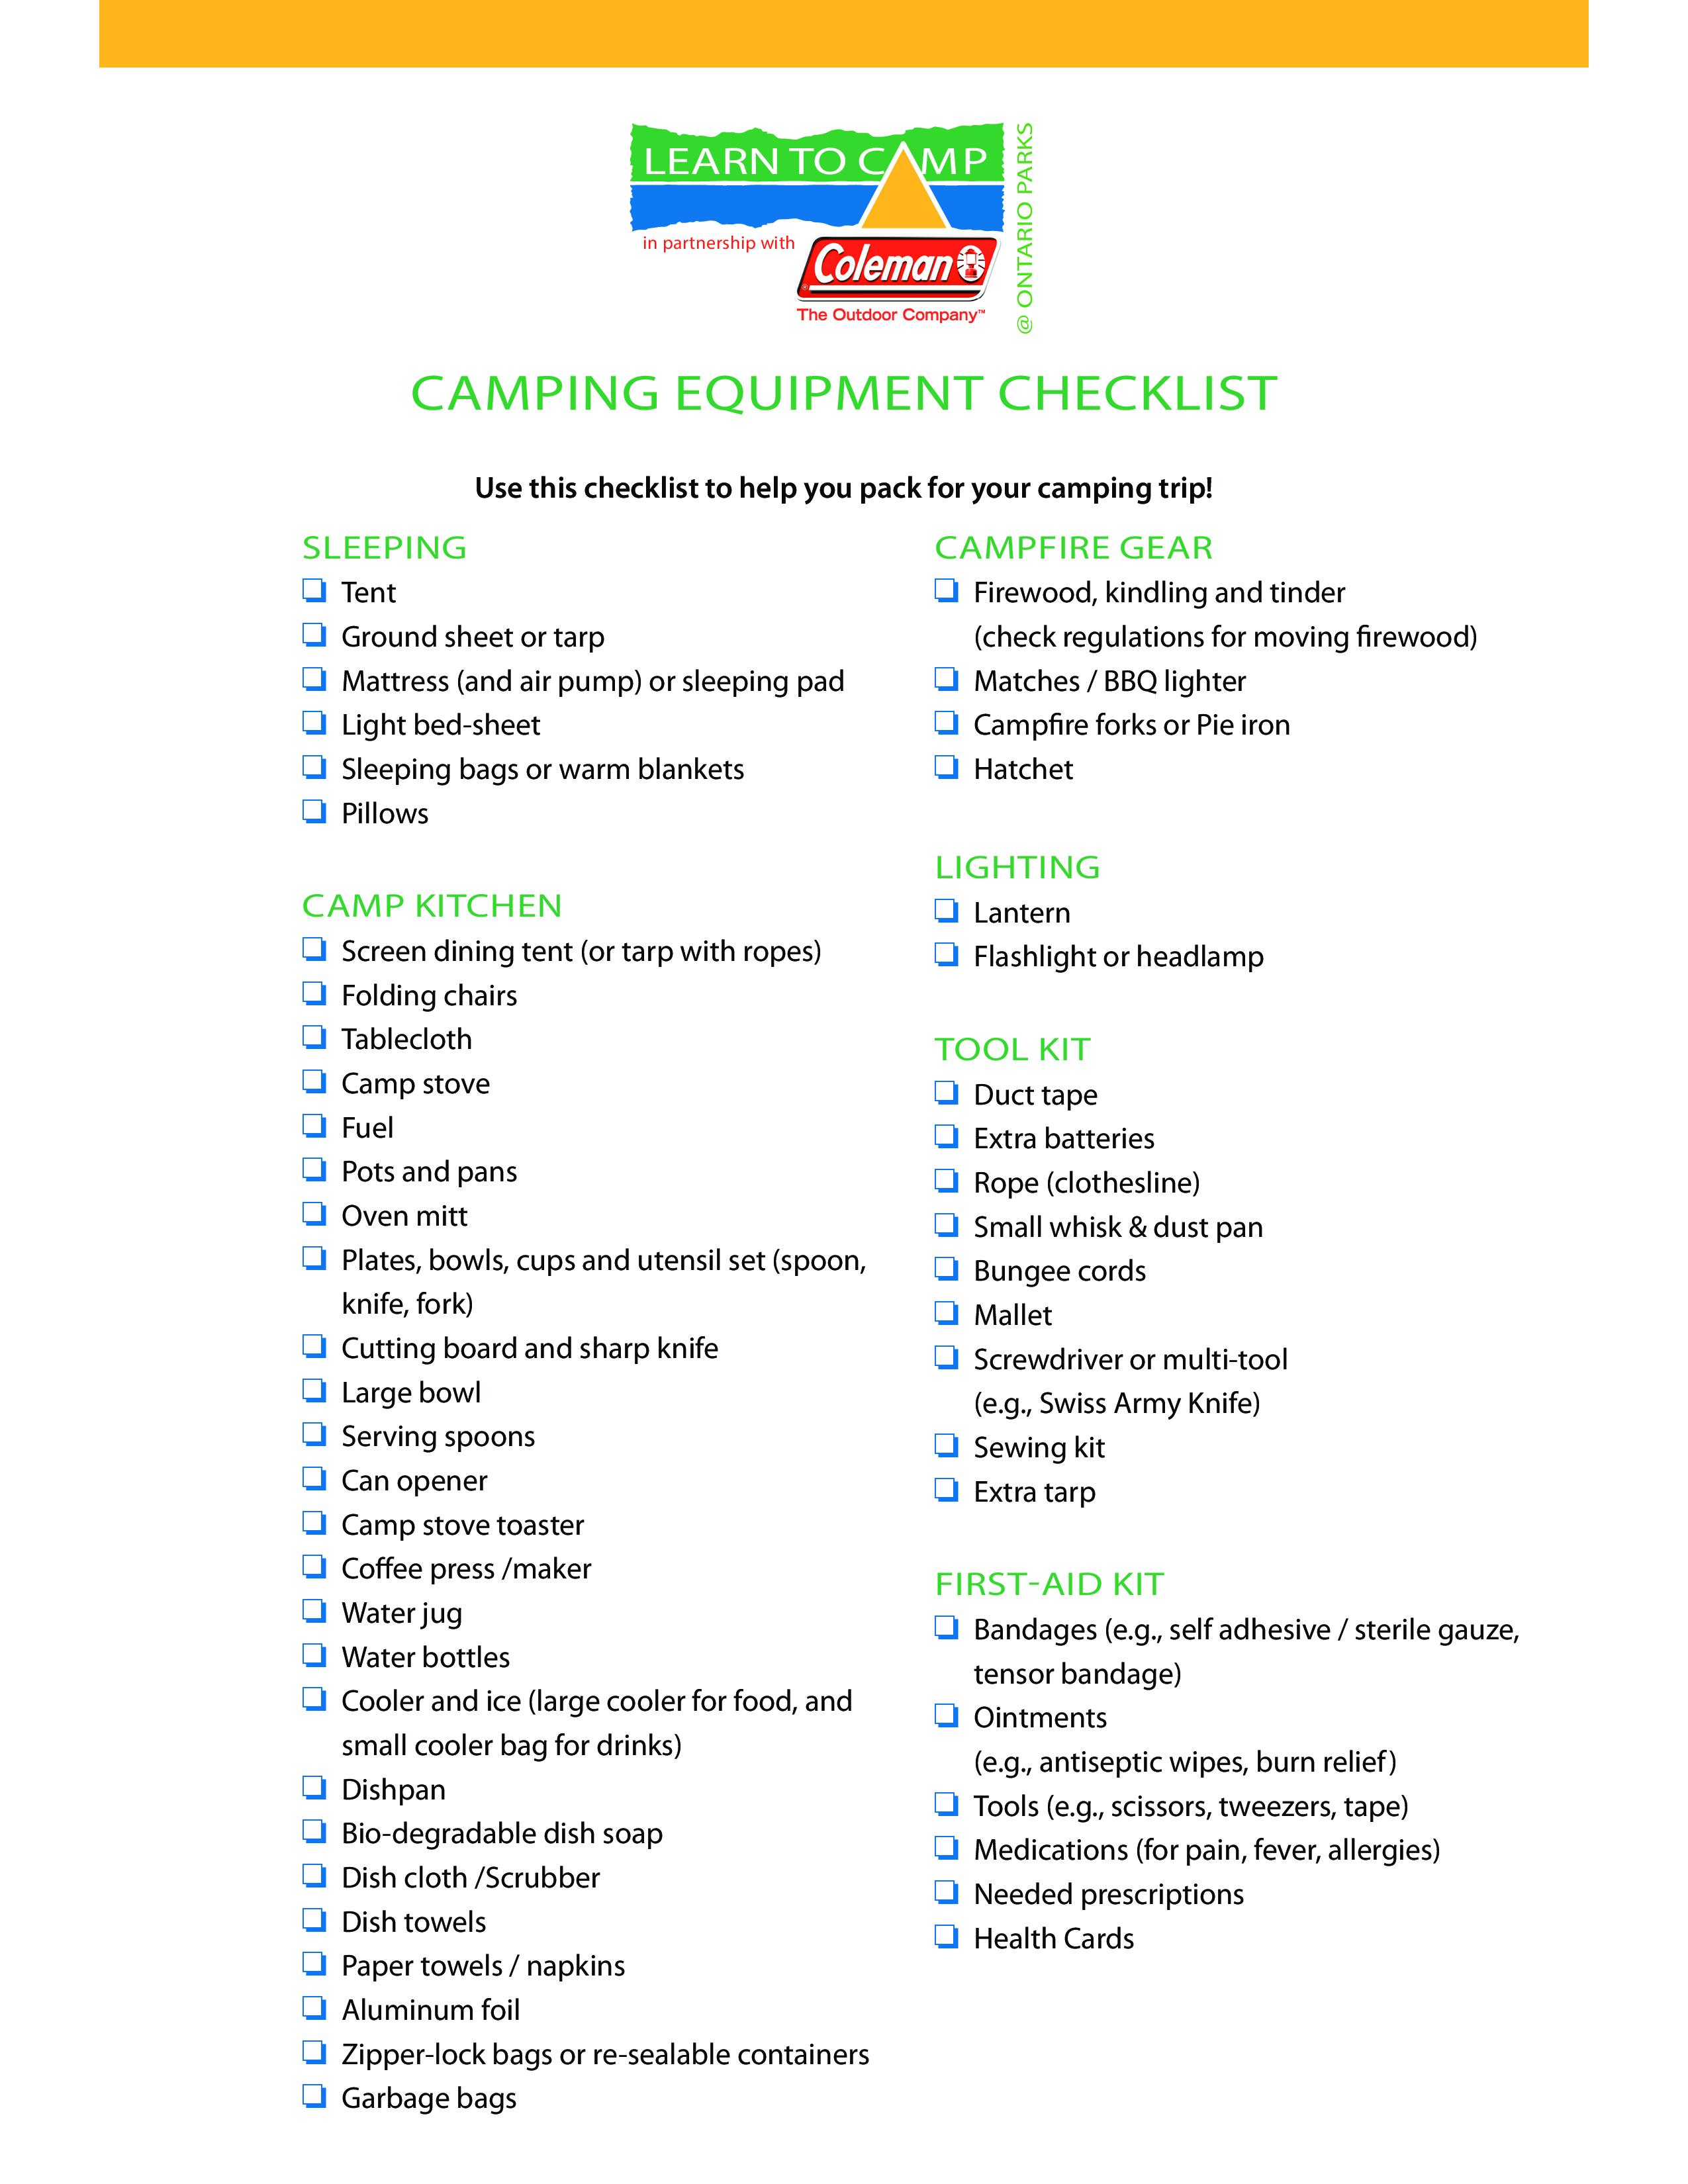 Camping Equipment Checklist Templates At Allbusinesstemplates Com